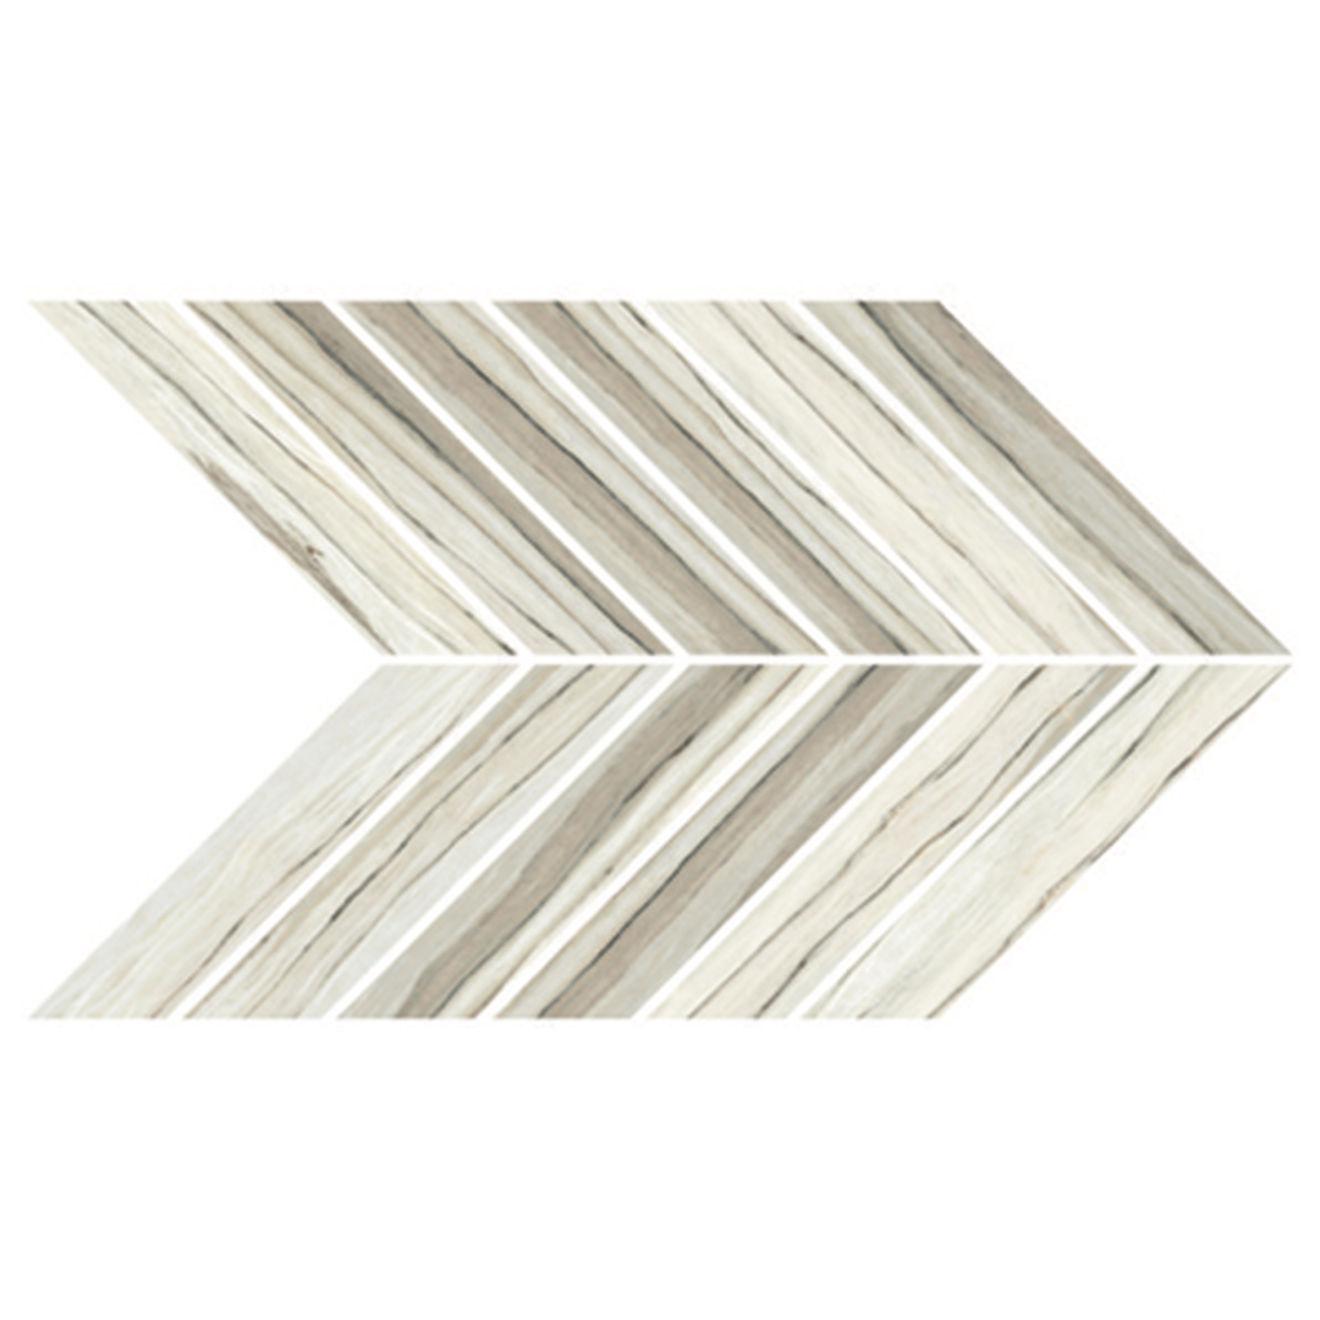 Zebrino Floor & Wall Mosaic in Classico